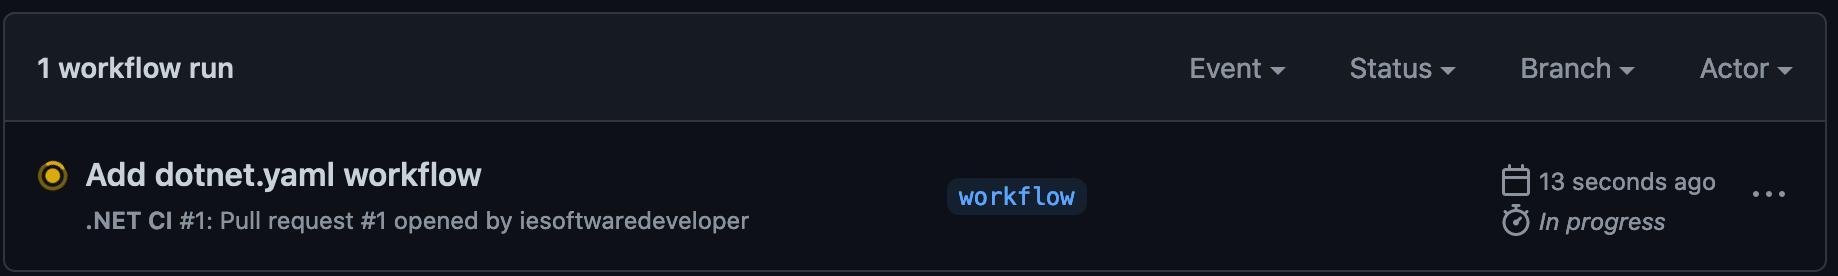 "Screenshot showing workflow running on ""workflow"" branch"